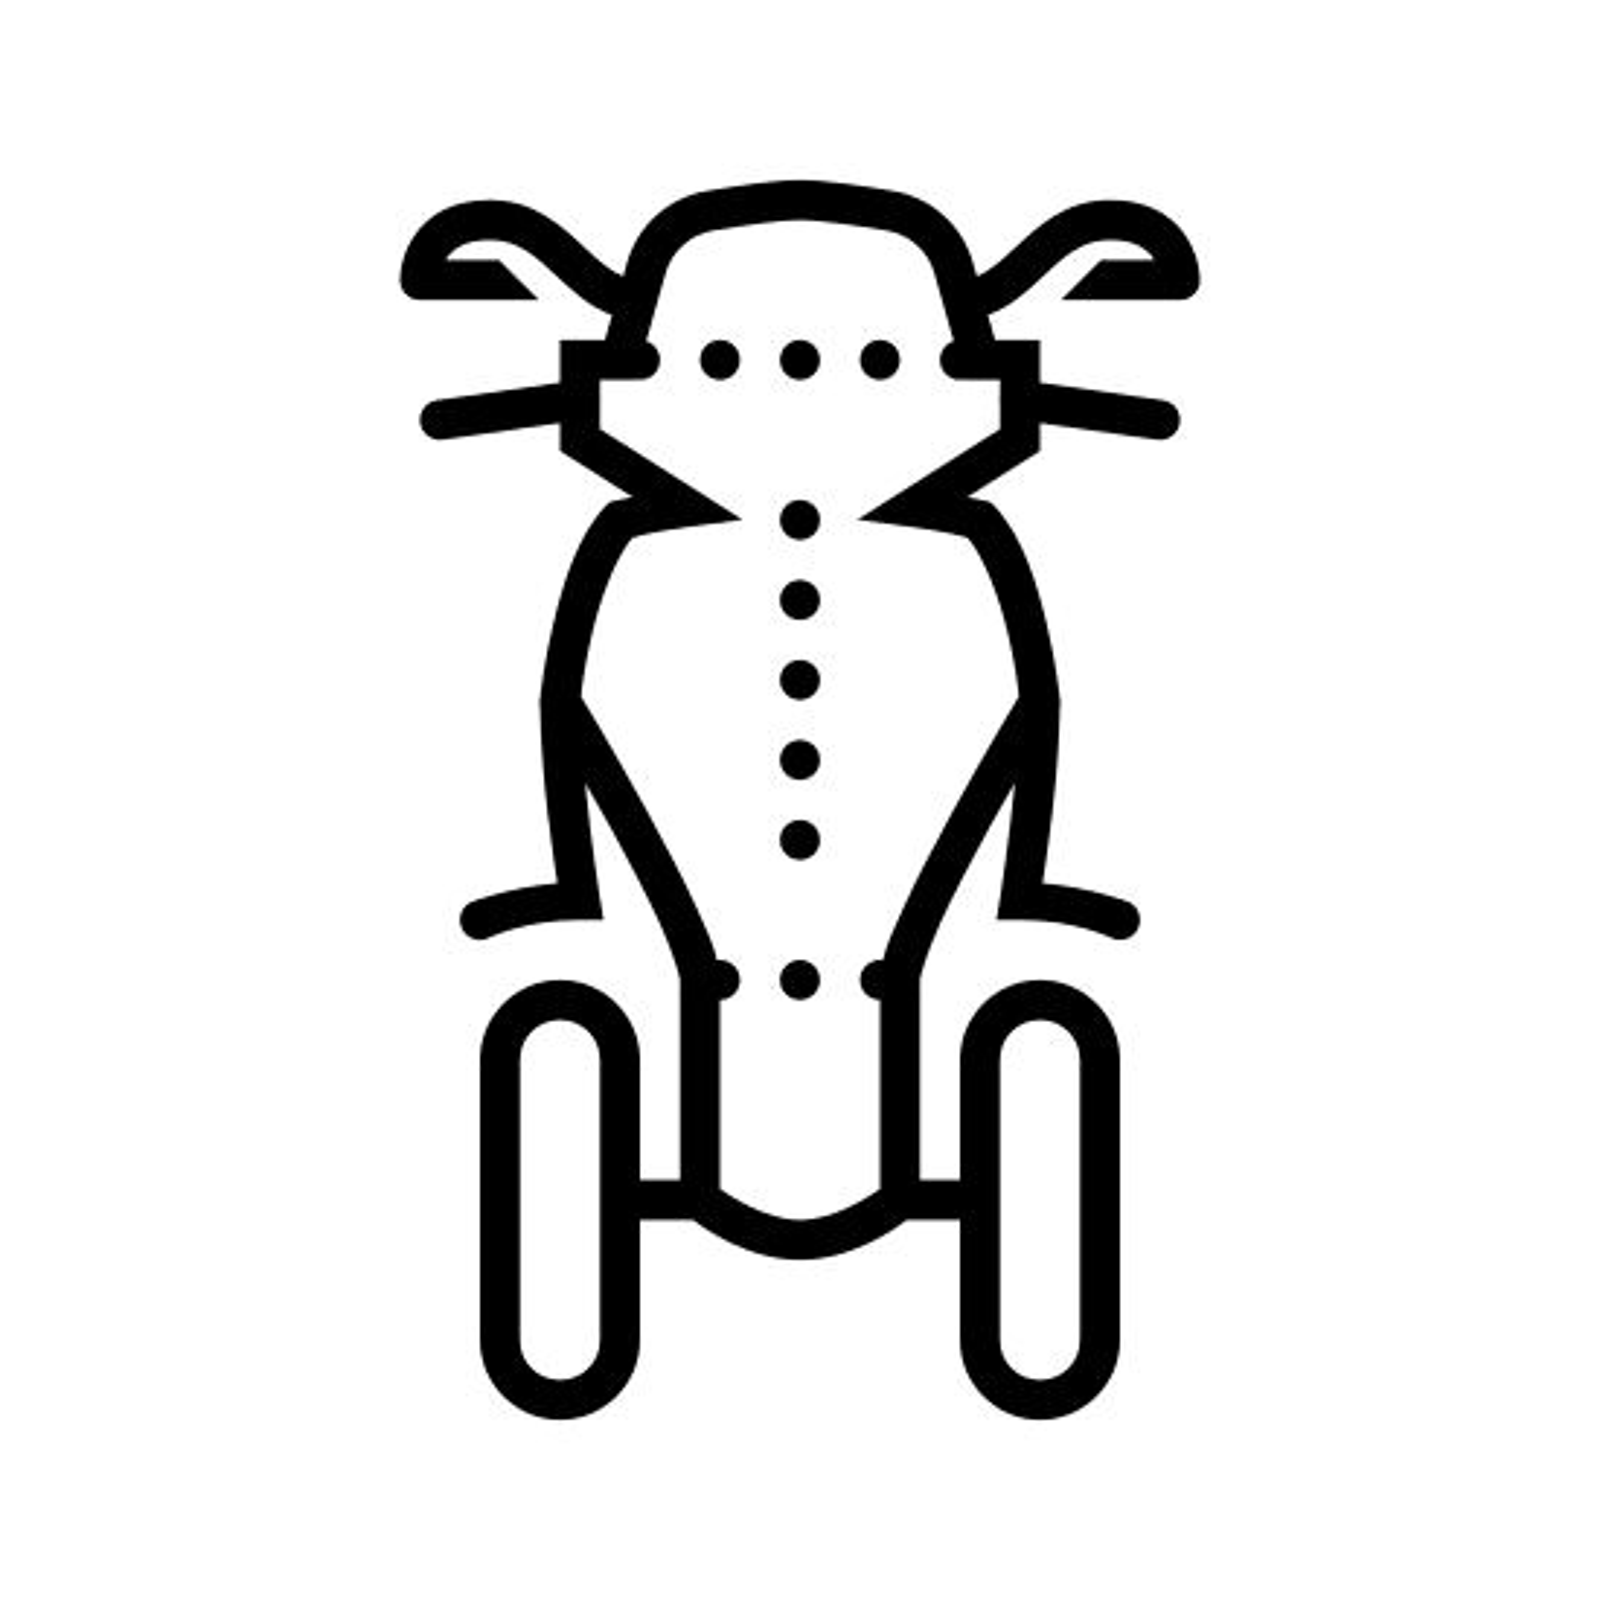 3 Skuter icon